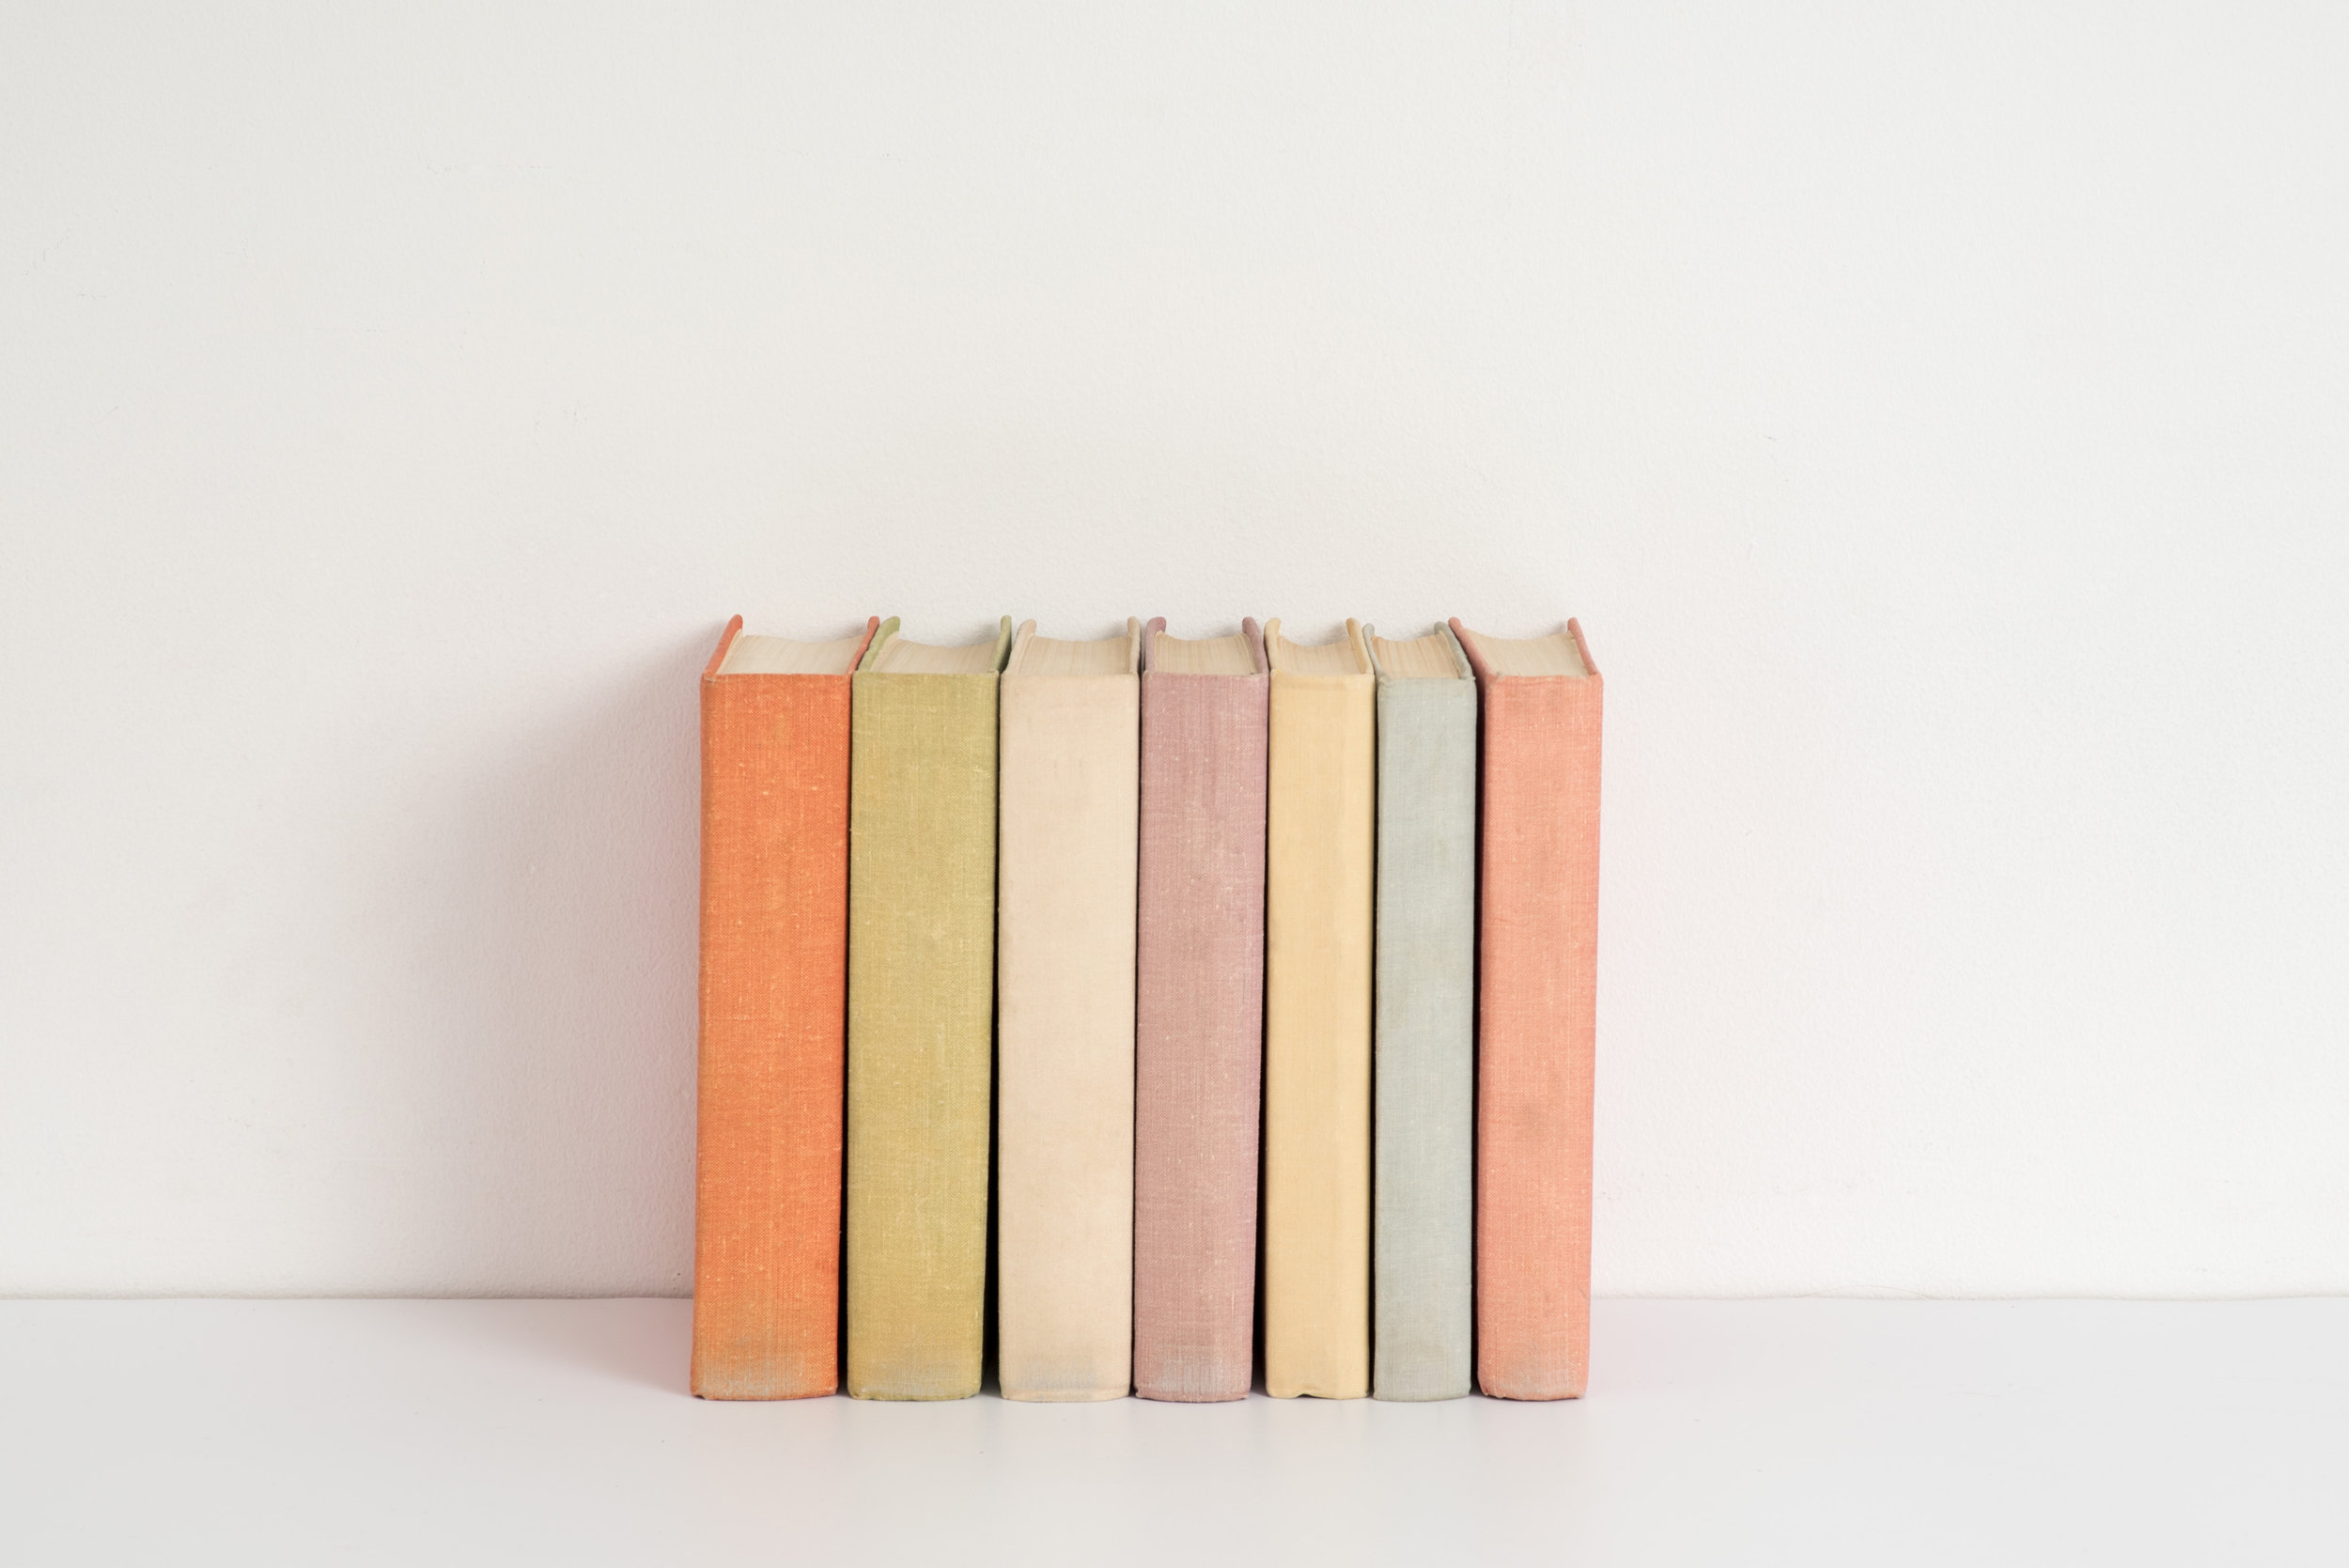 colorful-hardback-books-on-the-shelf-2.jpg